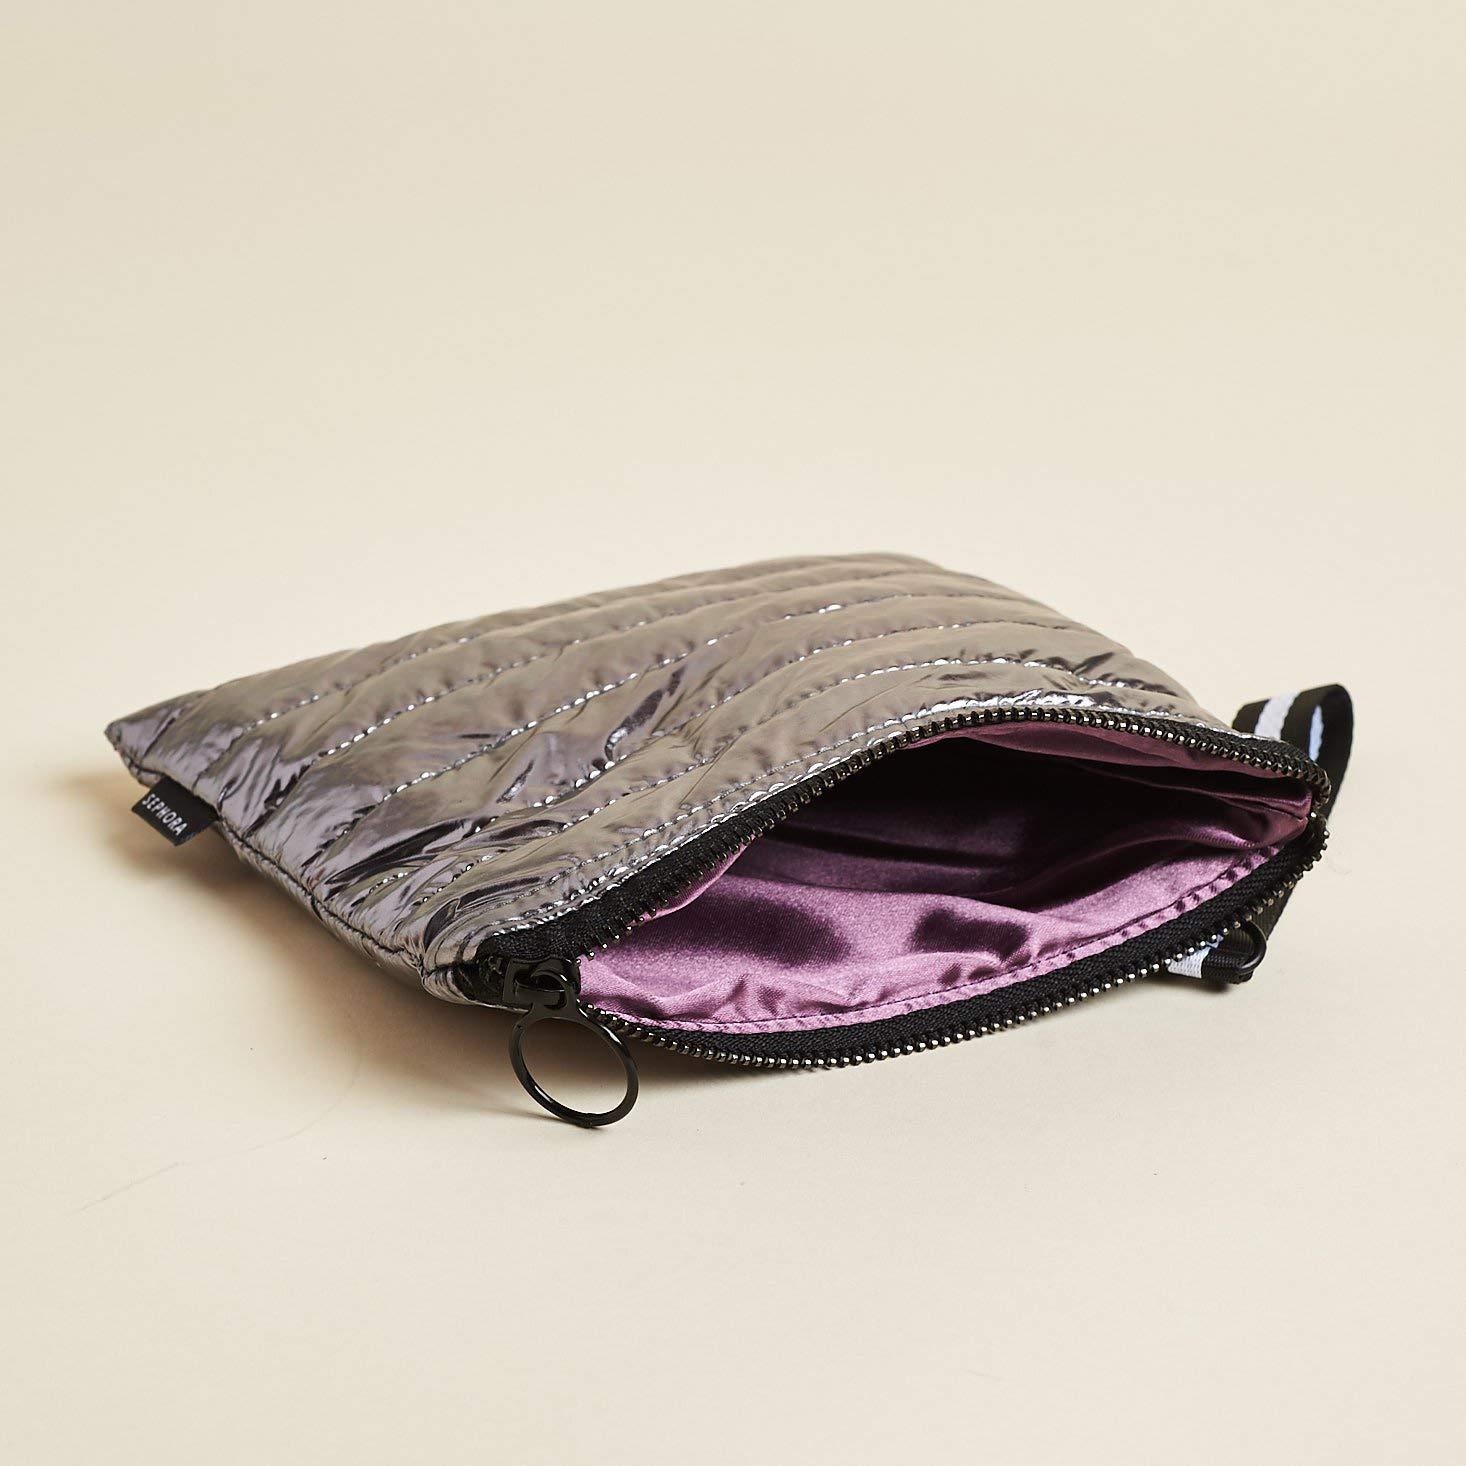 Amazon.com: Sephora Silver Puffer Cosmetic Bag, Luxe Vol.2 ...